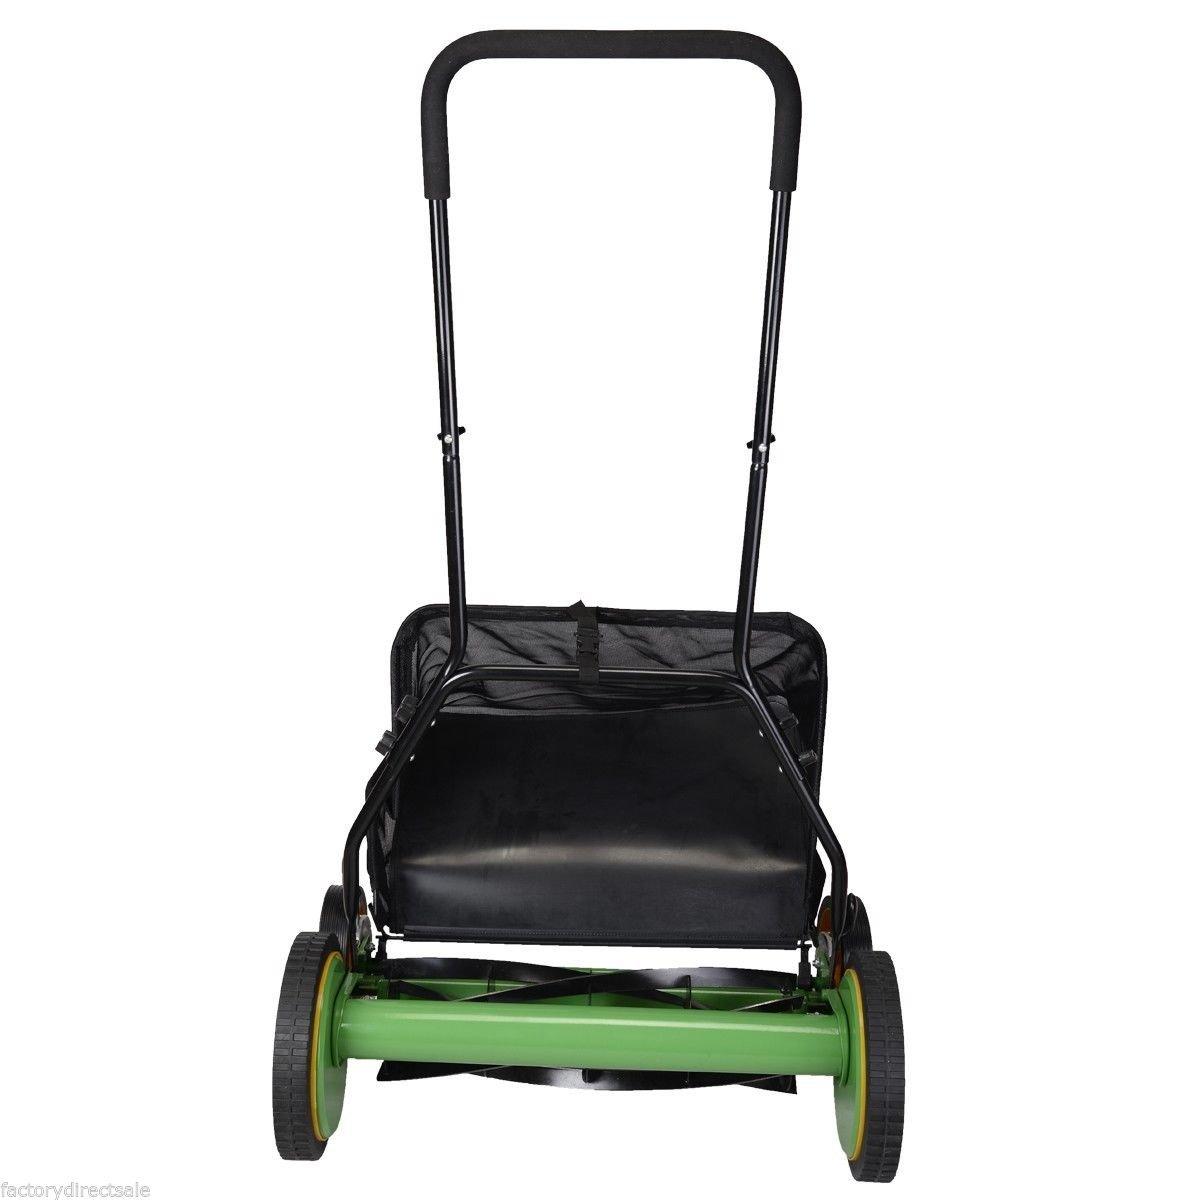 "20"" Height Adjustable Classic Hand Push Lawn Mower Reel Grass Catcher"